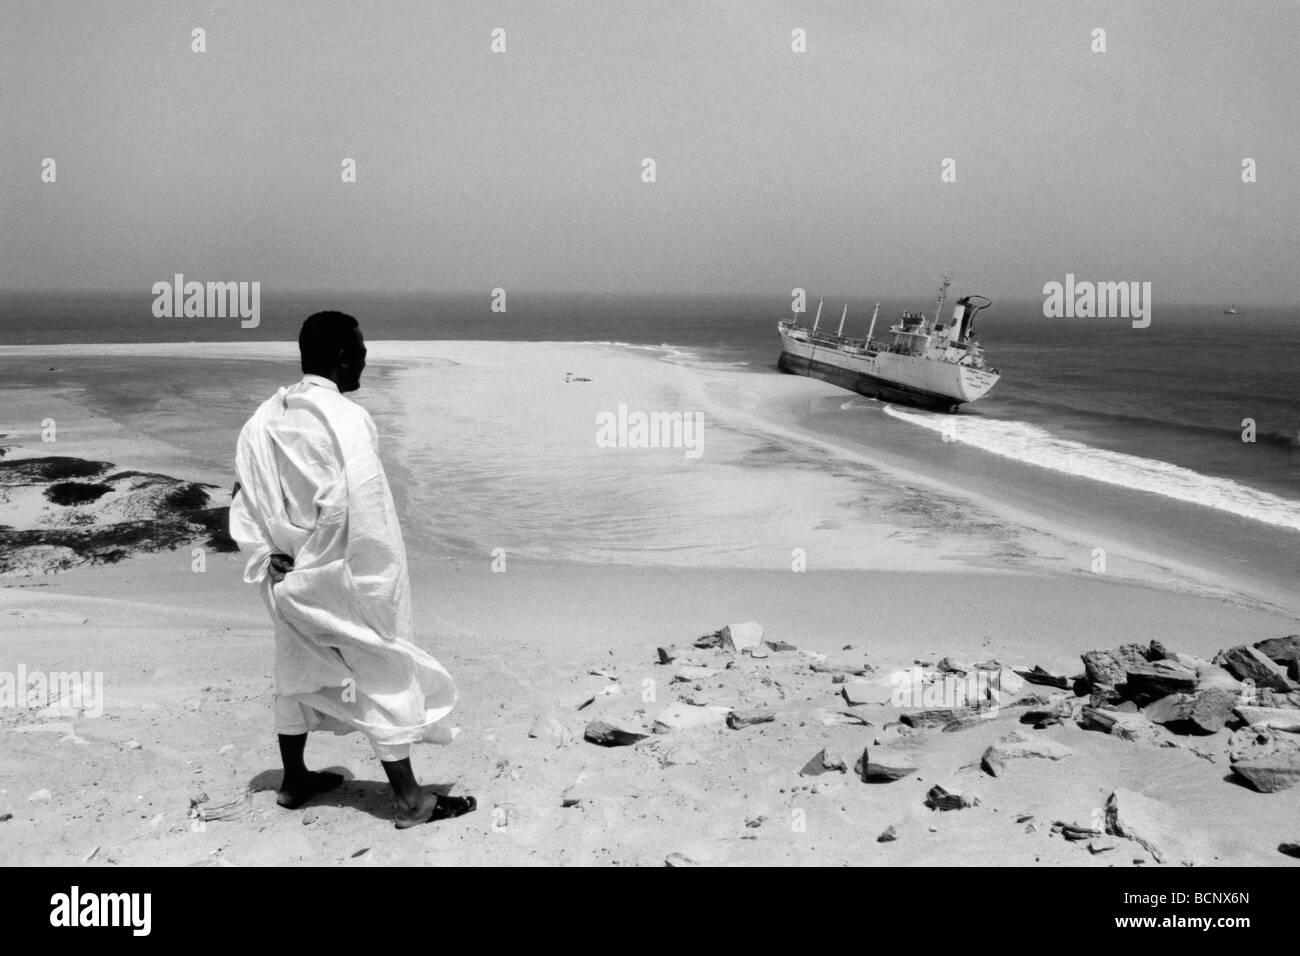 mauritania nouadihbou - Stock Image